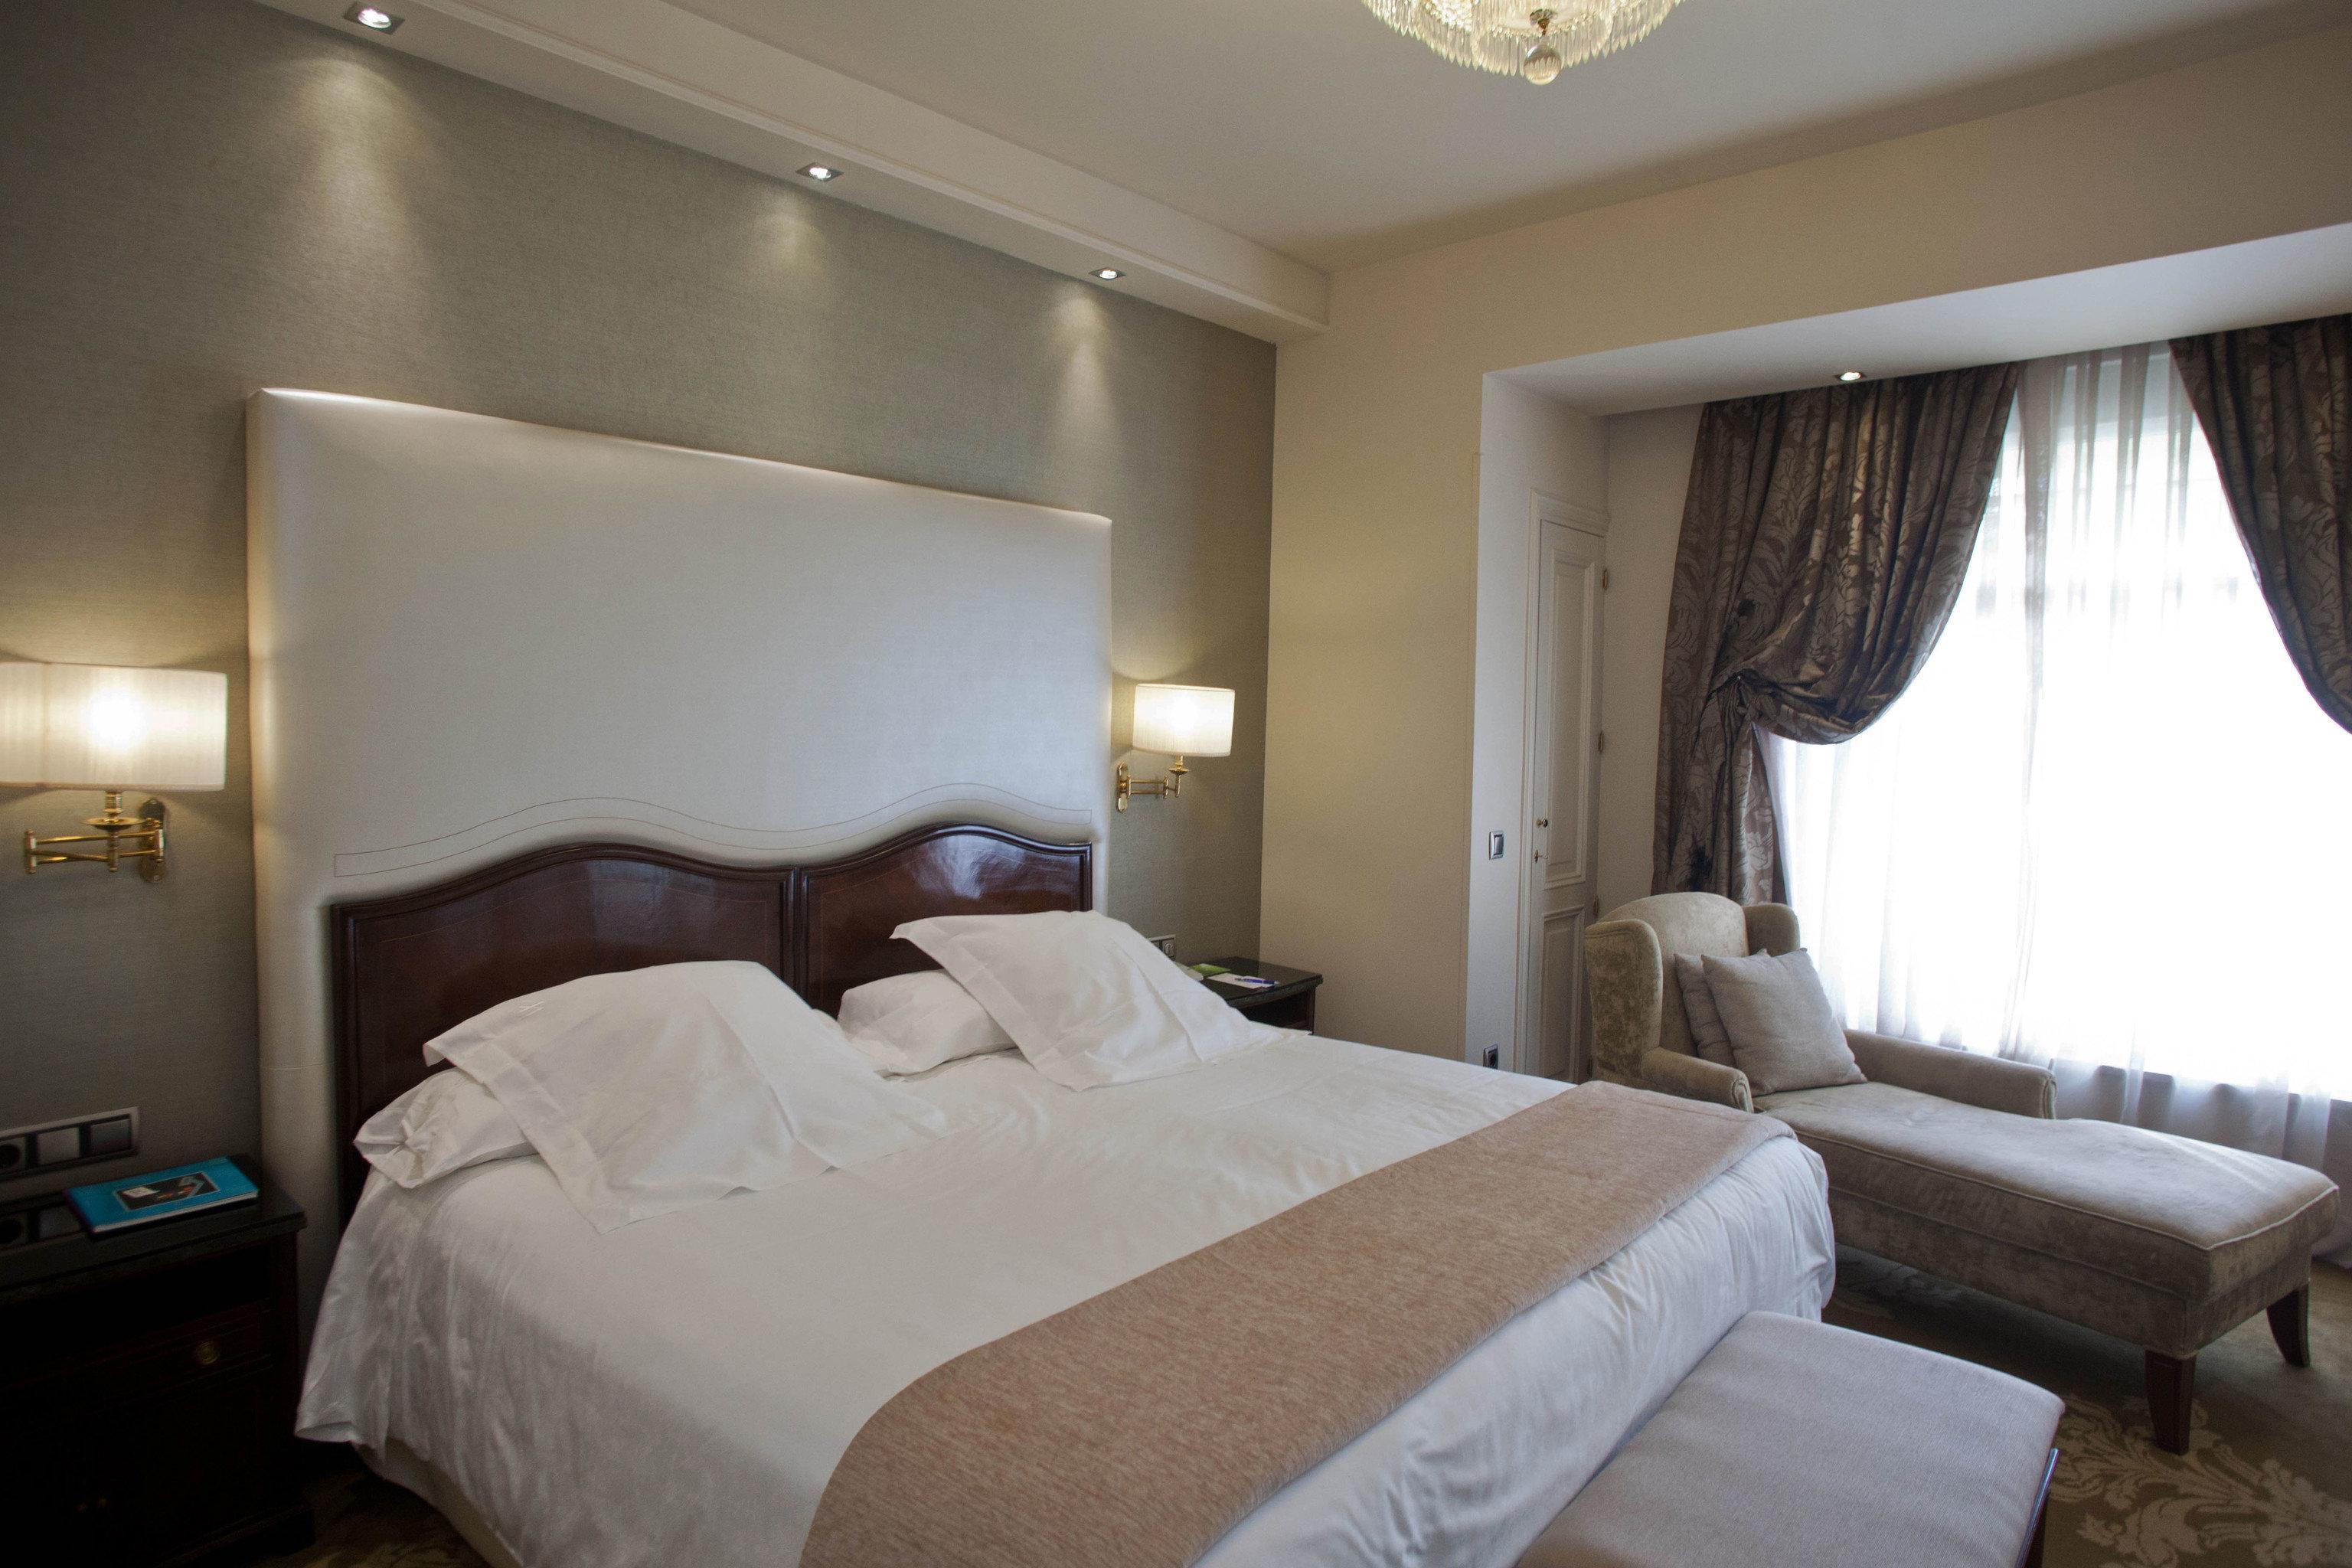 Hotels Madrid Spain Bedroom property Suite cottage condominium